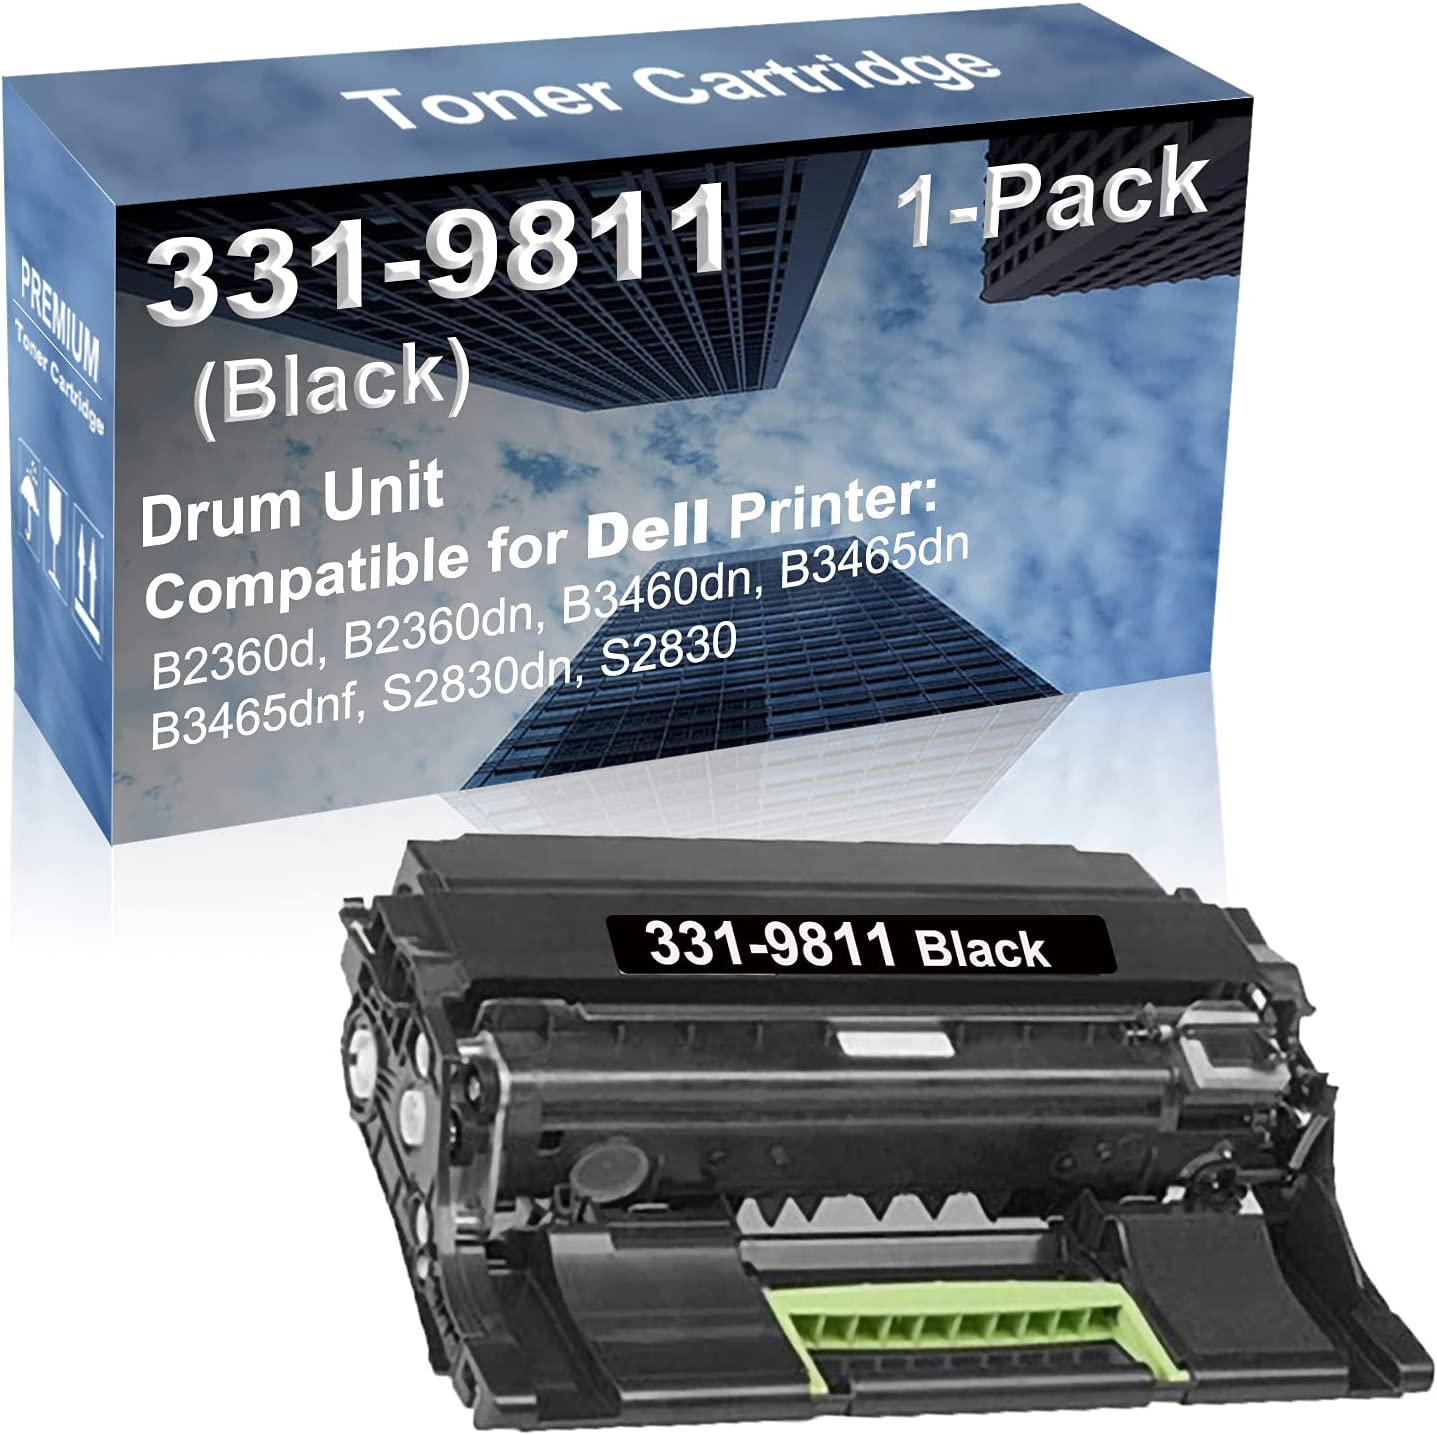 1-Pack Black Compatible B3460dn B3465dn Printer Unit Ranking TOP11 Rep Memphis Mall Drum